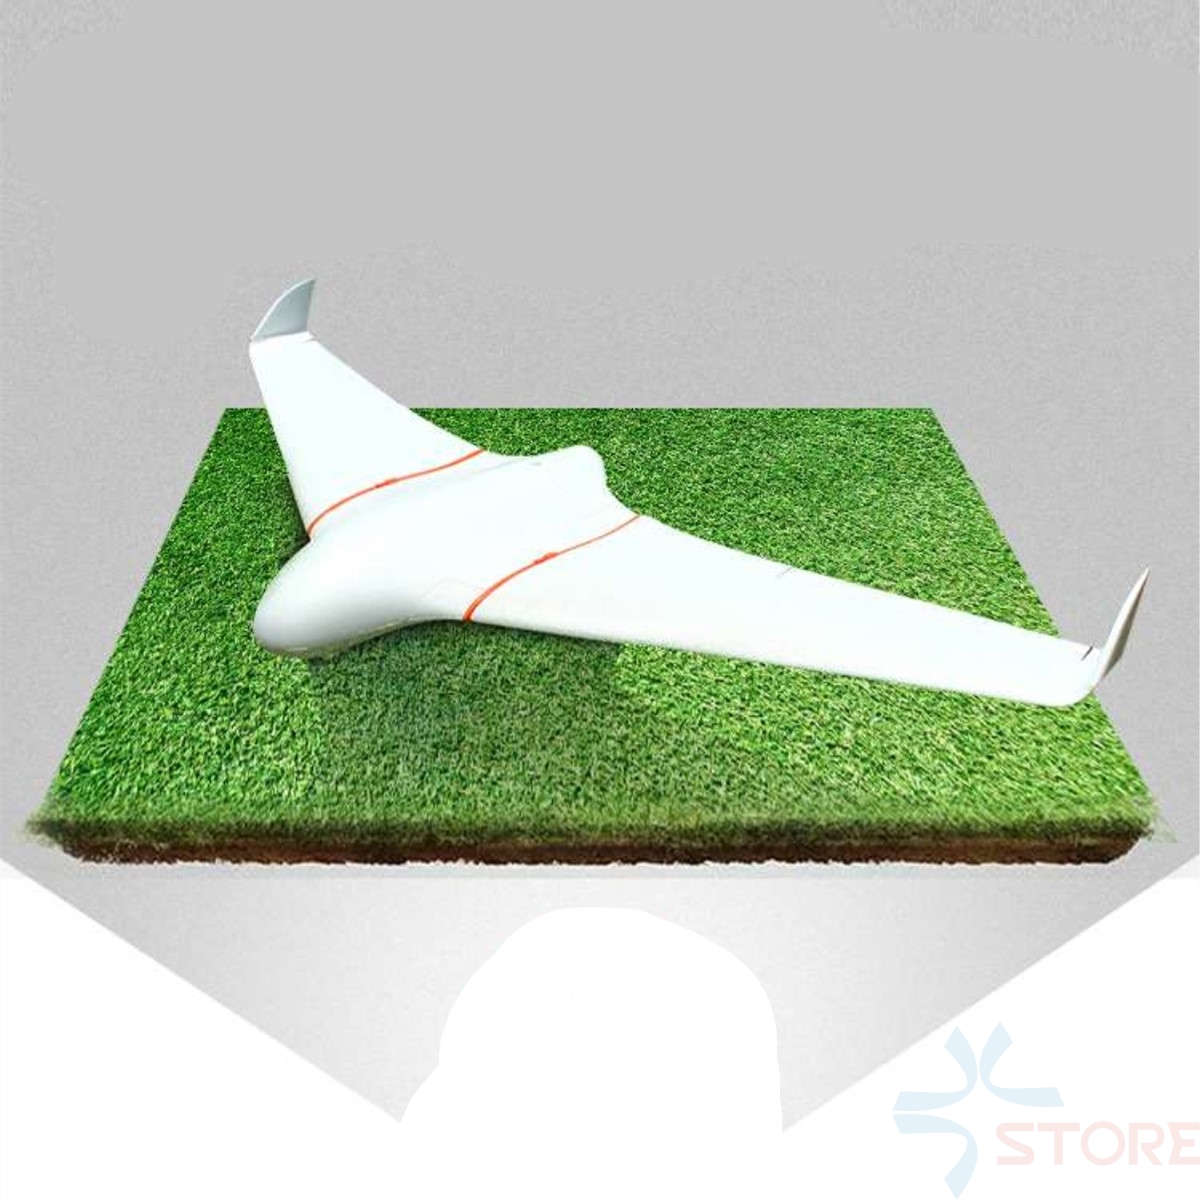 Skywalker x8 x-8 white UAV Flying Wing 2122mm epo large flying wing Best FPV airplane kit fpv x uav talon uav 1720mm fpv plane gray white version flying glider epo modle rc model airplane